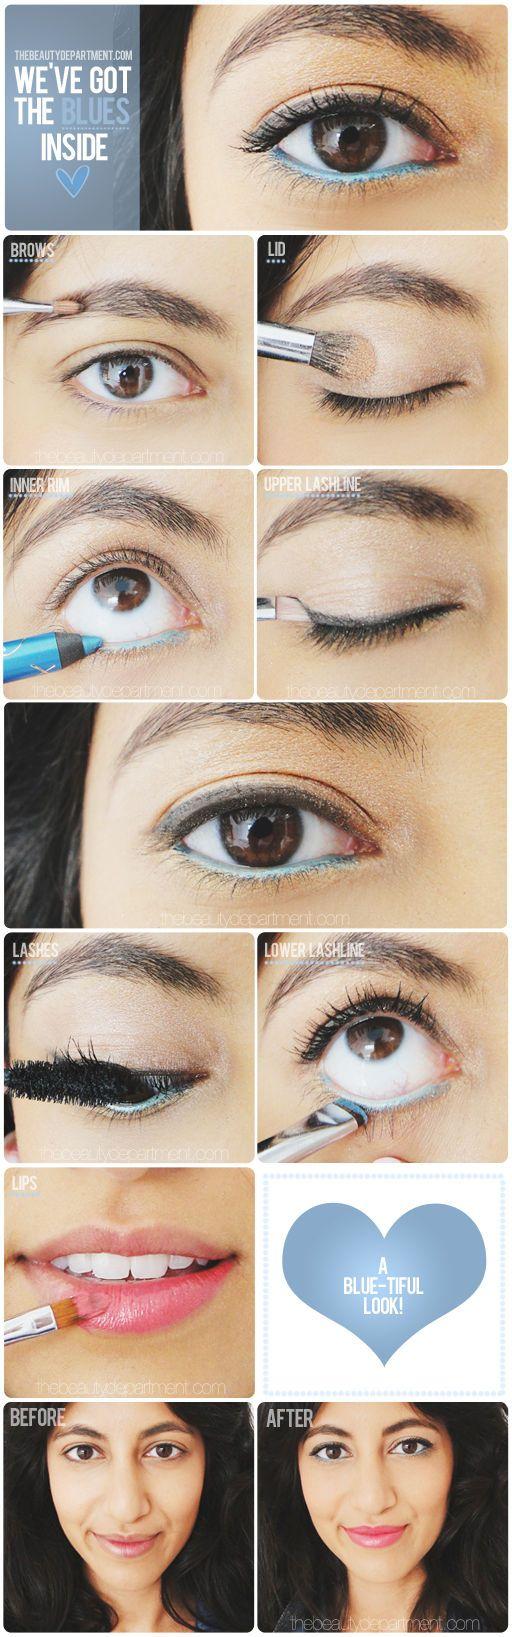 DIY Five Minute Makeup Pop blue girl makeup make up diy eyeshadow diy ideas do it yourself easy diy brush diy tips diy makeup diy fashion diy tutorials brows